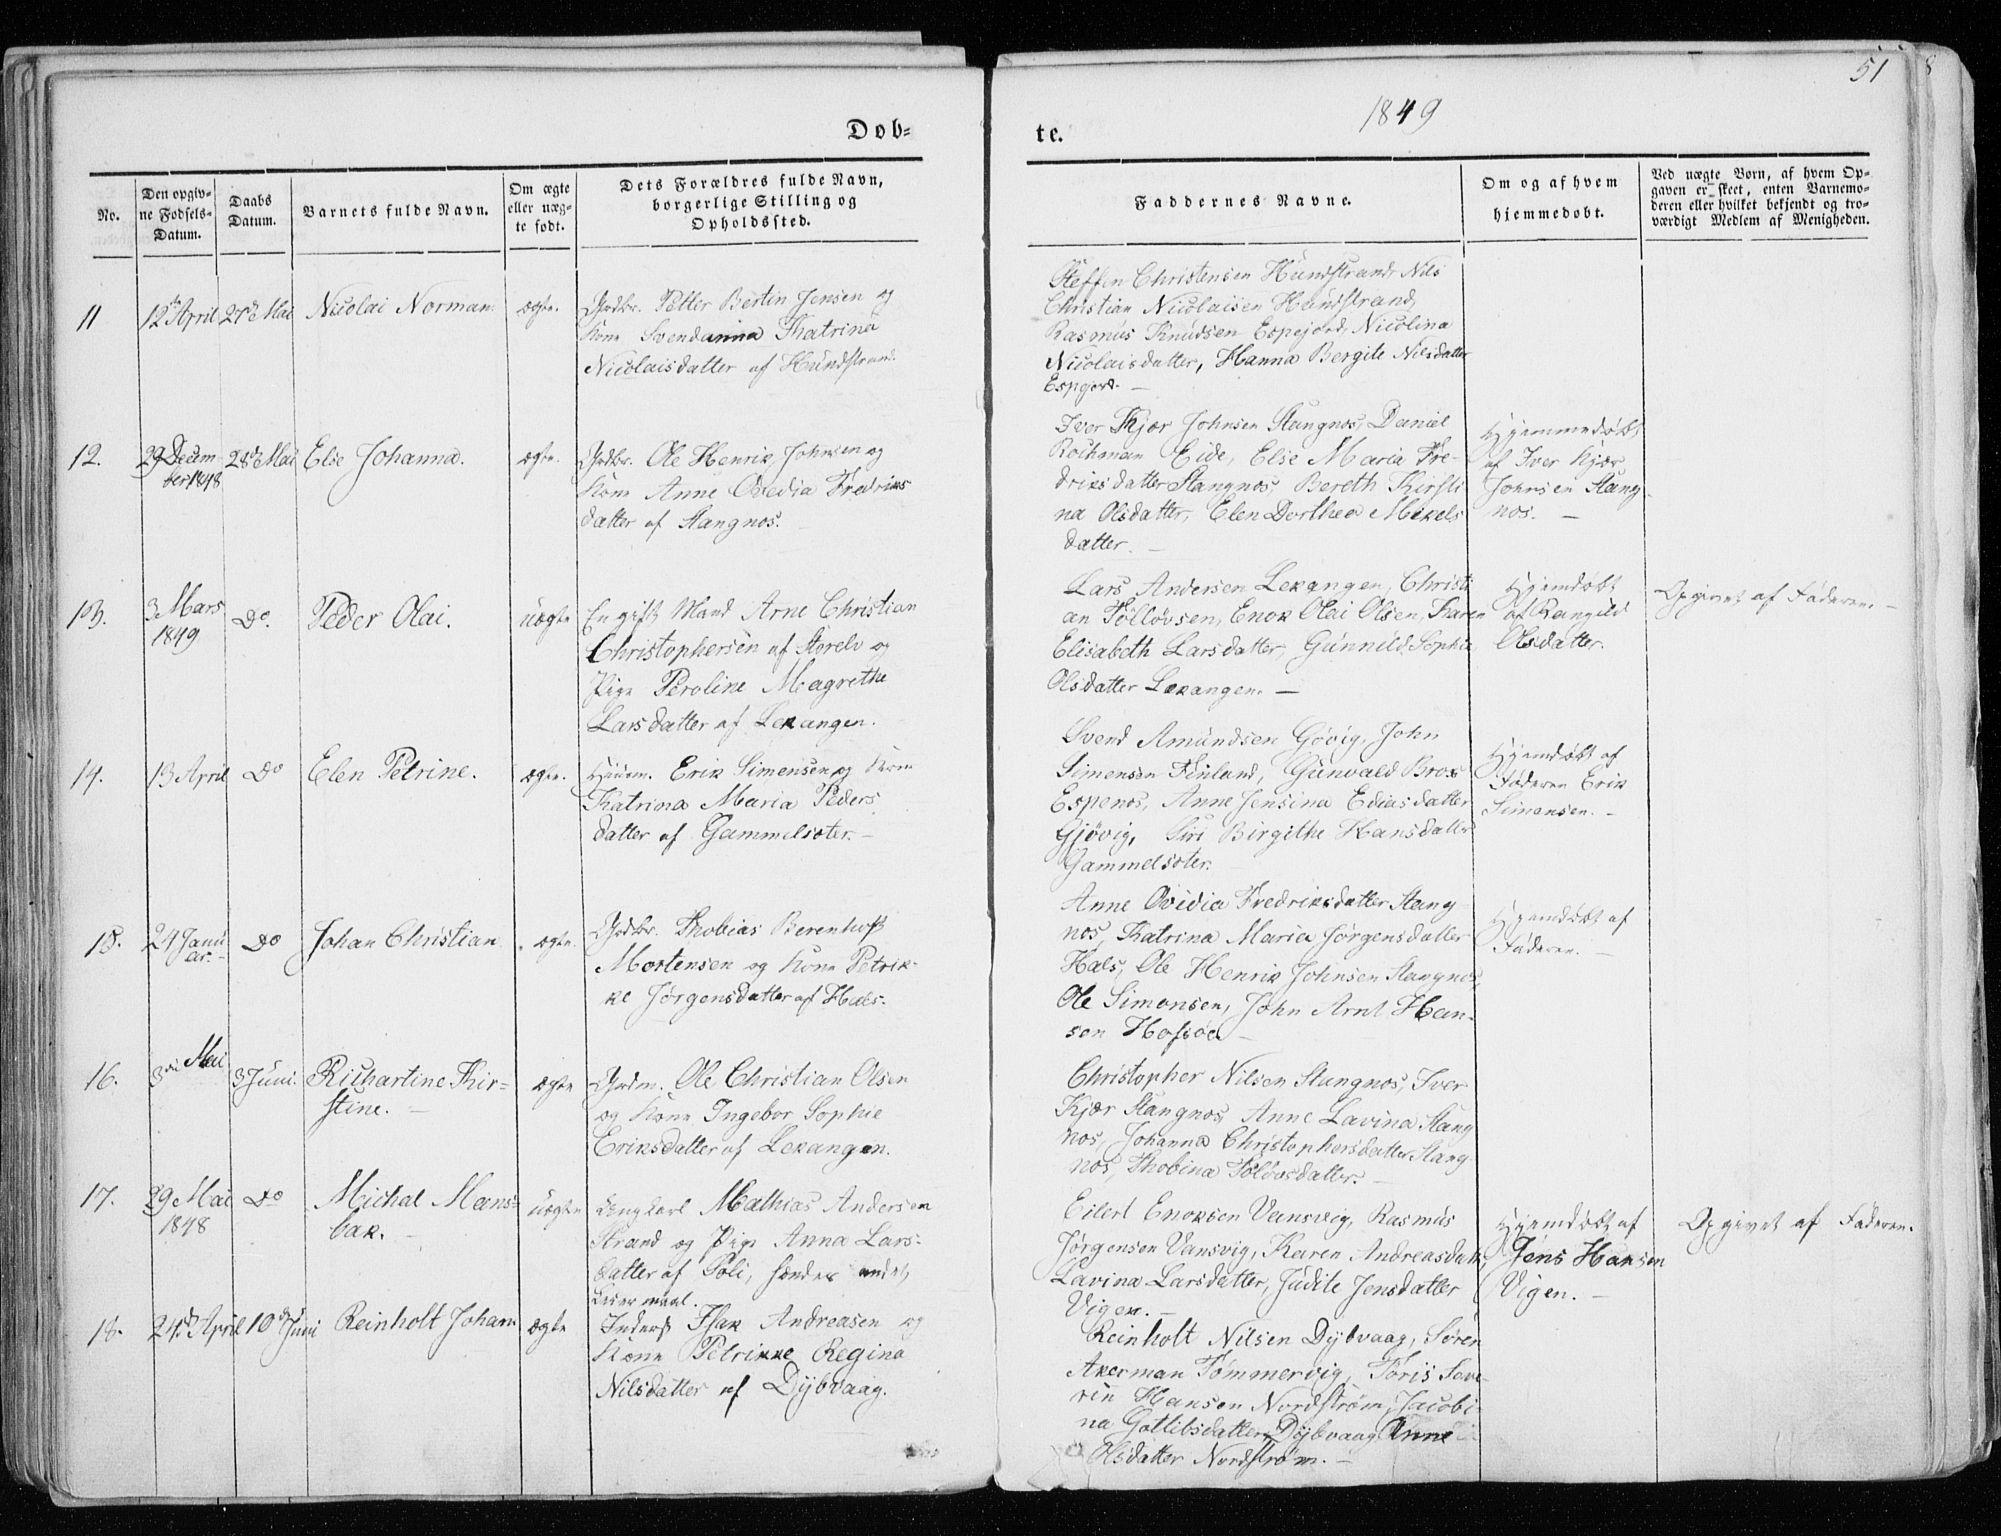 SATØ, Tranøy sokneprestkontor, I/Ia/Iaa/L0006kirke: Ministerialbok nr. 6, 1844-1855, s. 51